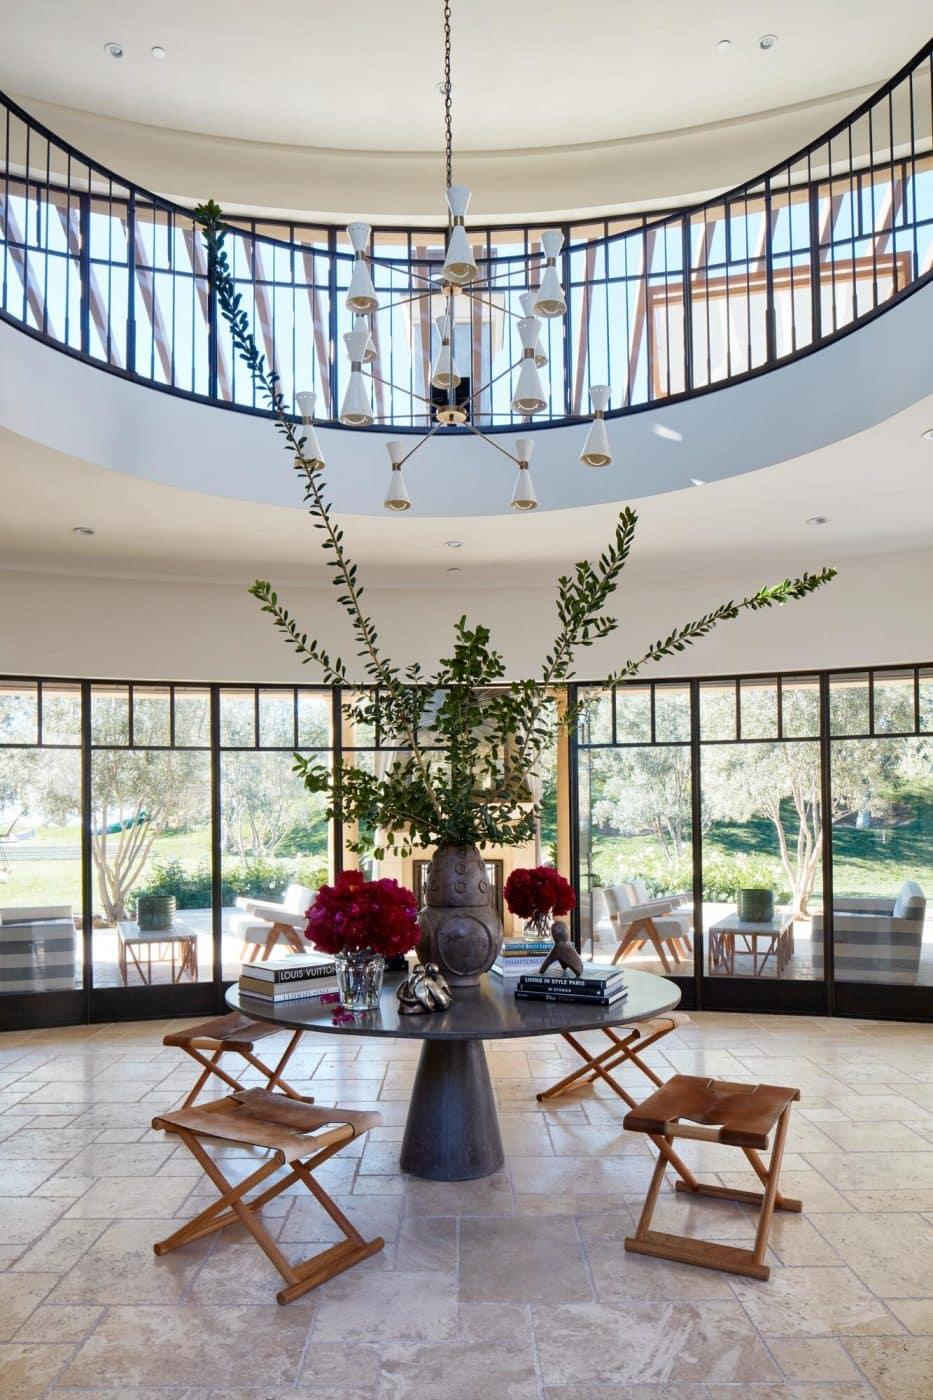 Kourtney Kardashian's house features a James de Wulf table